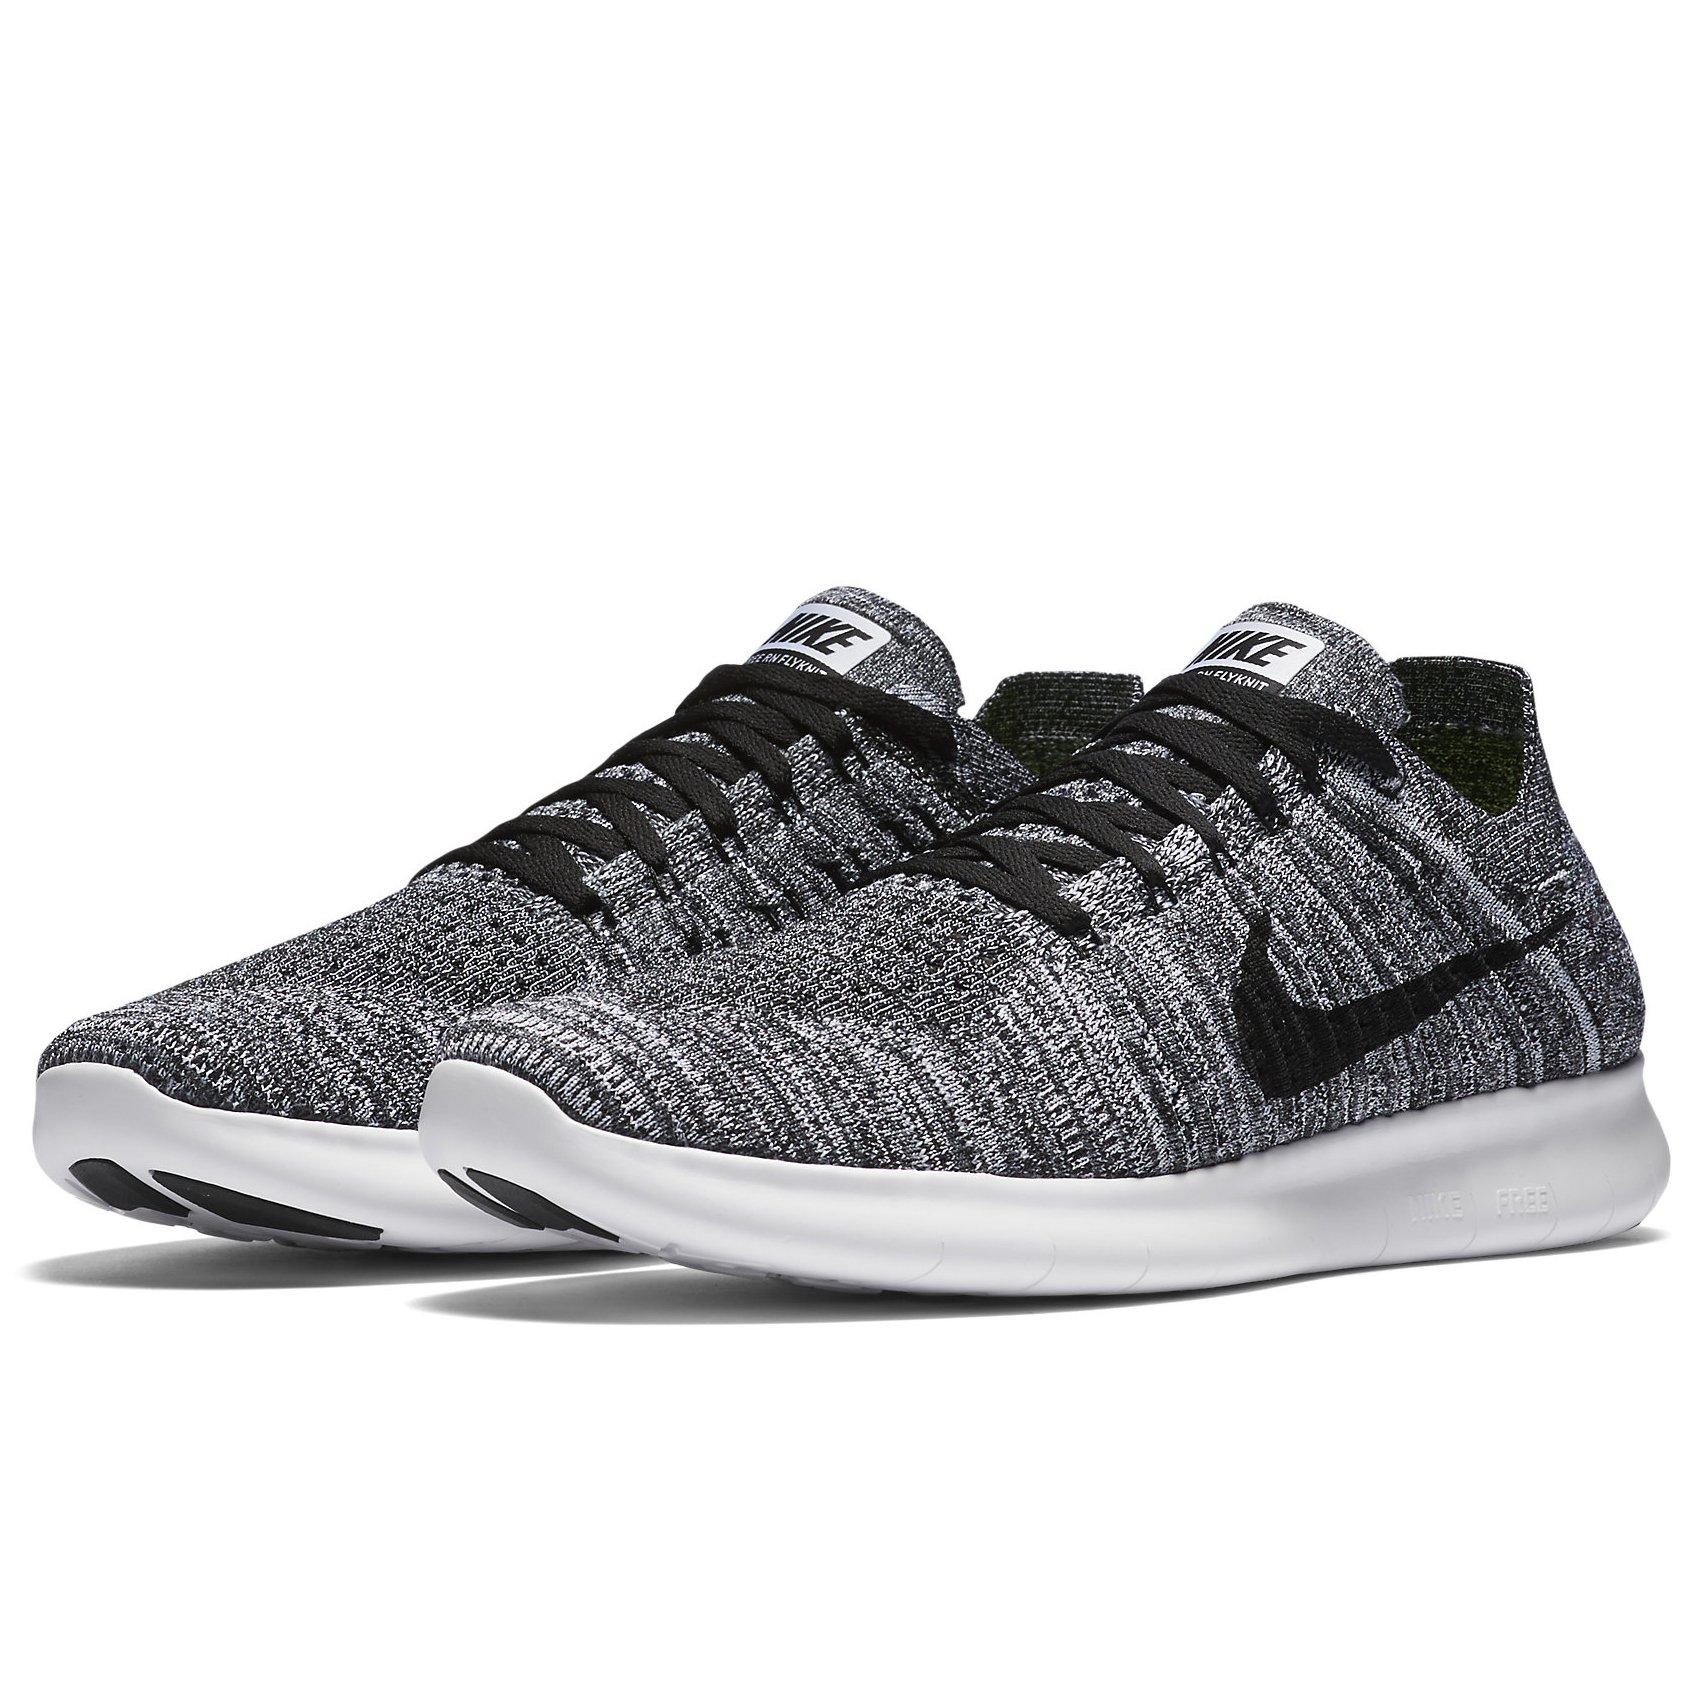 6df93b6d5610a Galleon - Nike Mens Free RN Flyknit Running Shoe WHITE BLACK-TOTAL  CRIMSON-BLUE LAGOON 14.0